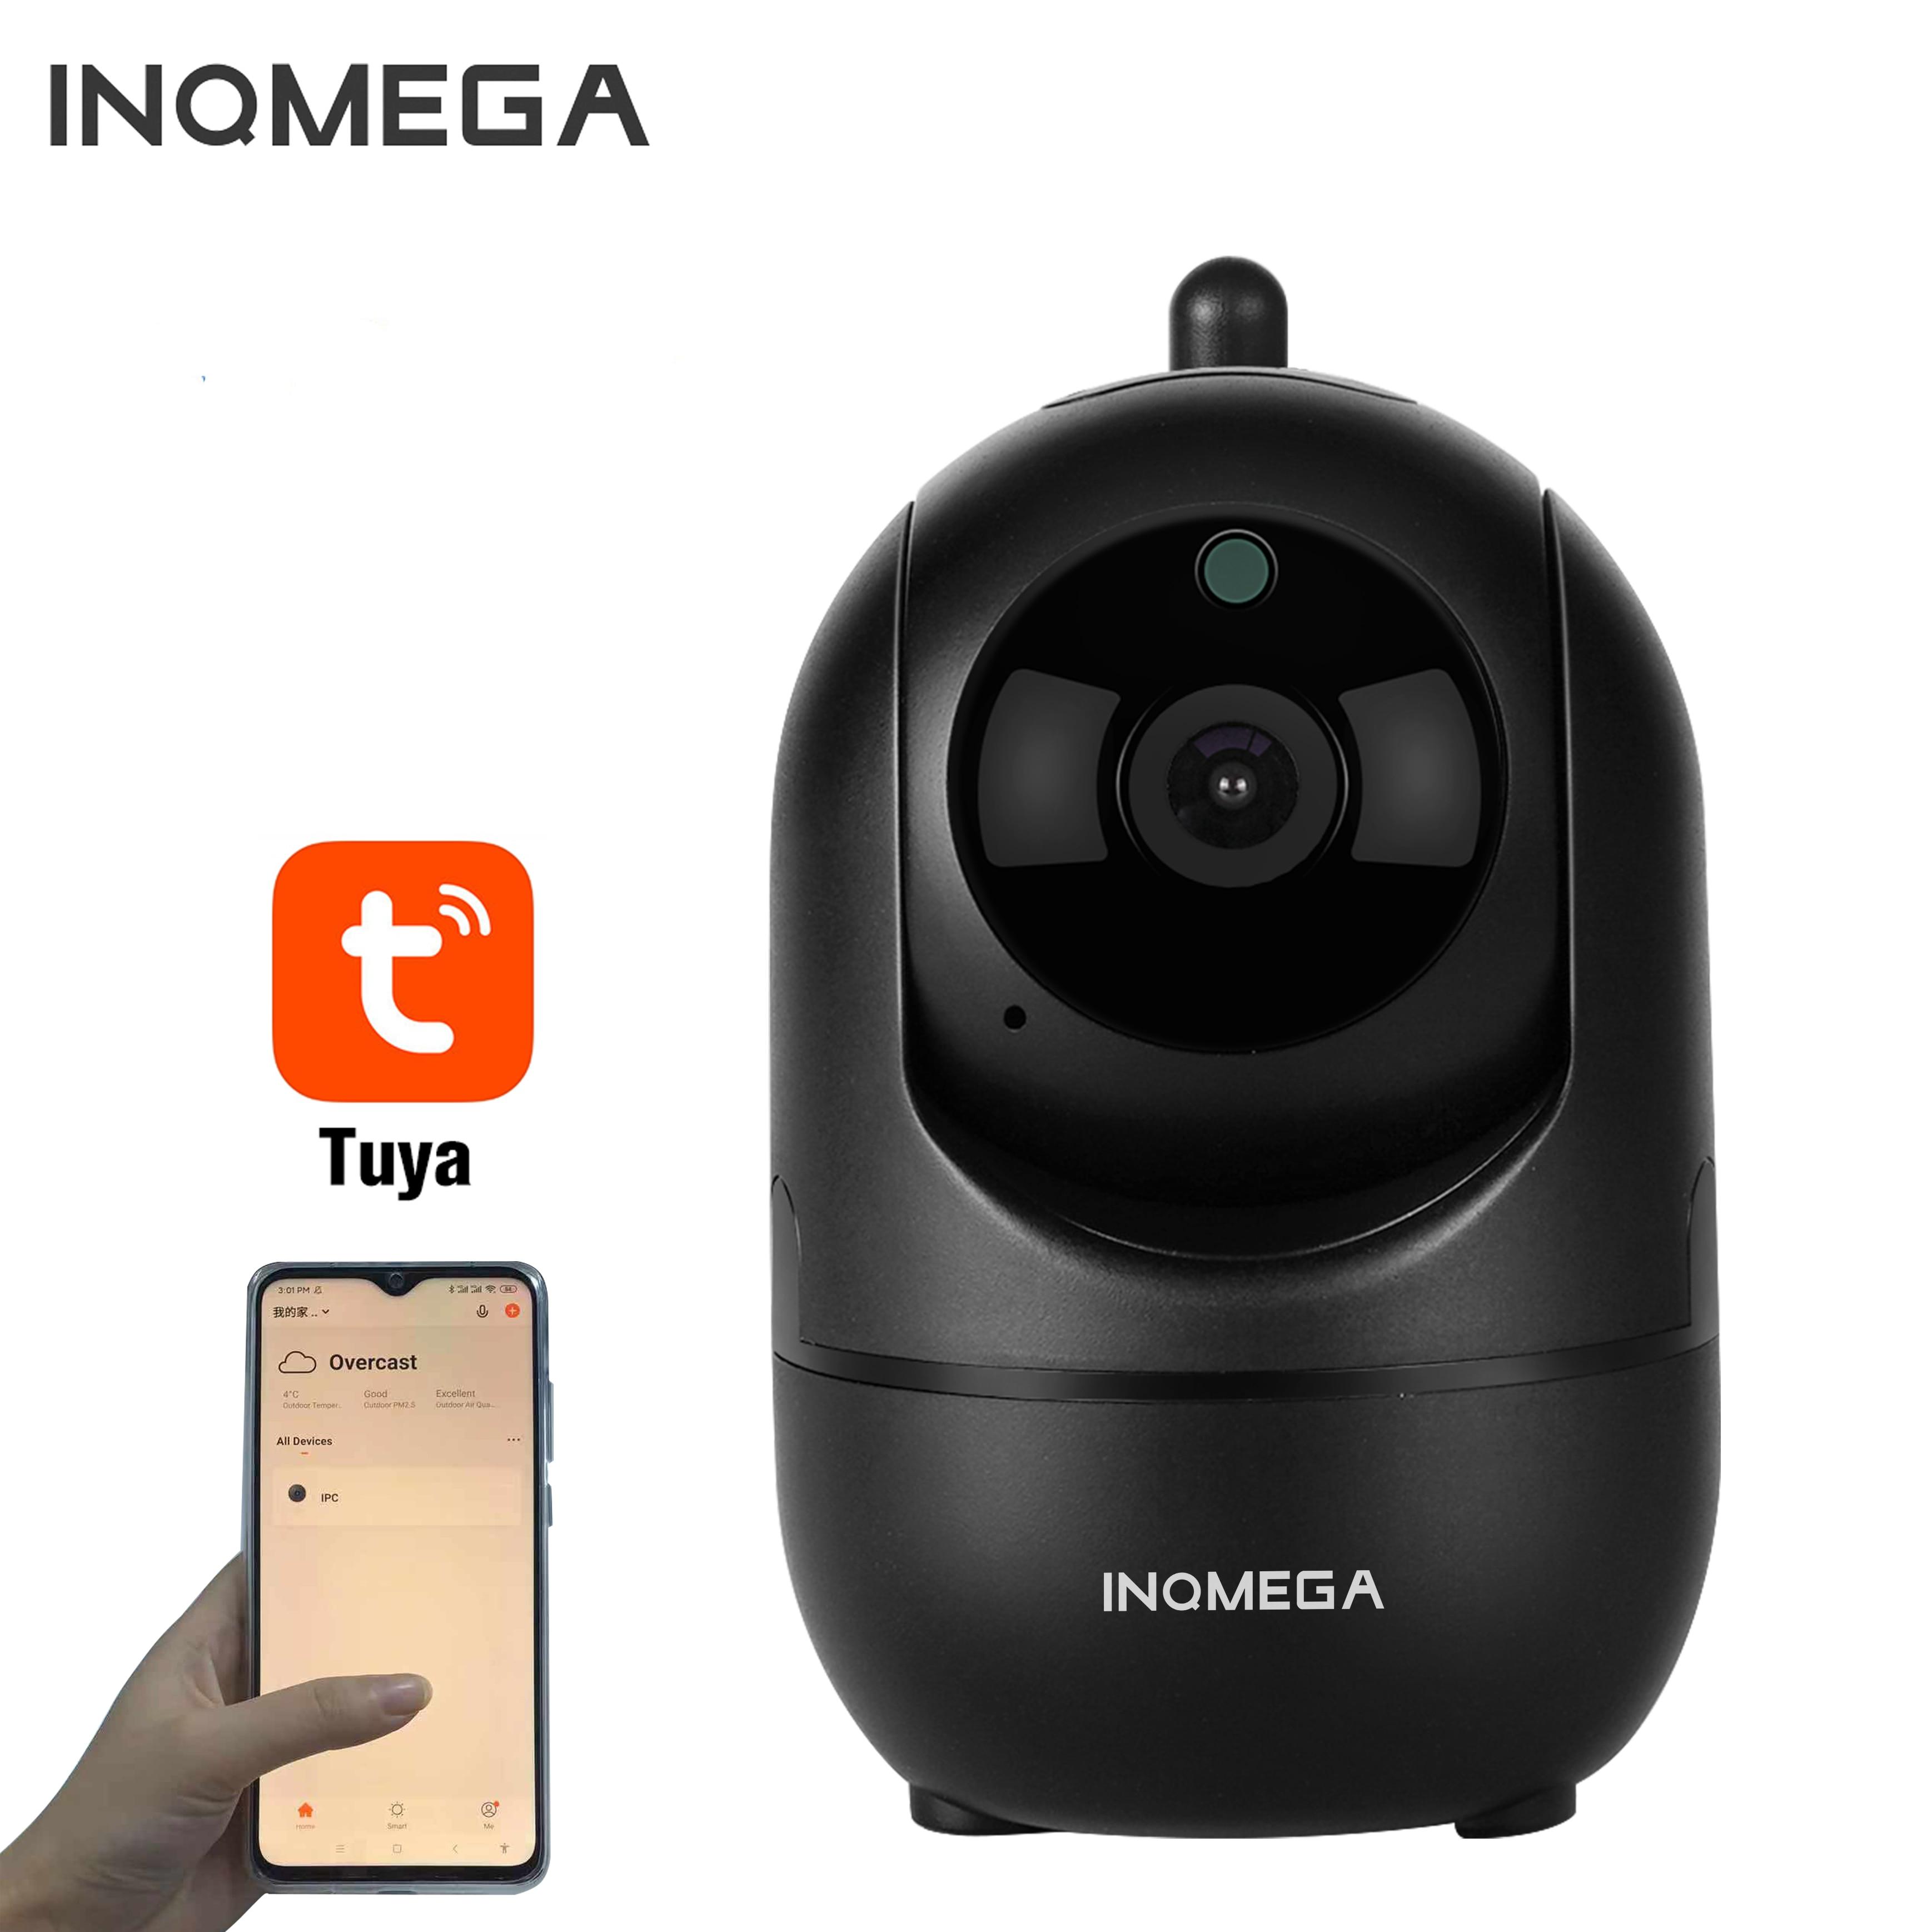 INQMEGA TUYA IP Kamera Home Security Surveillance Kamera CCTV Netzwerk Wifi Kamera Wireless Cam Tuya Smart Leben Baby Moniter